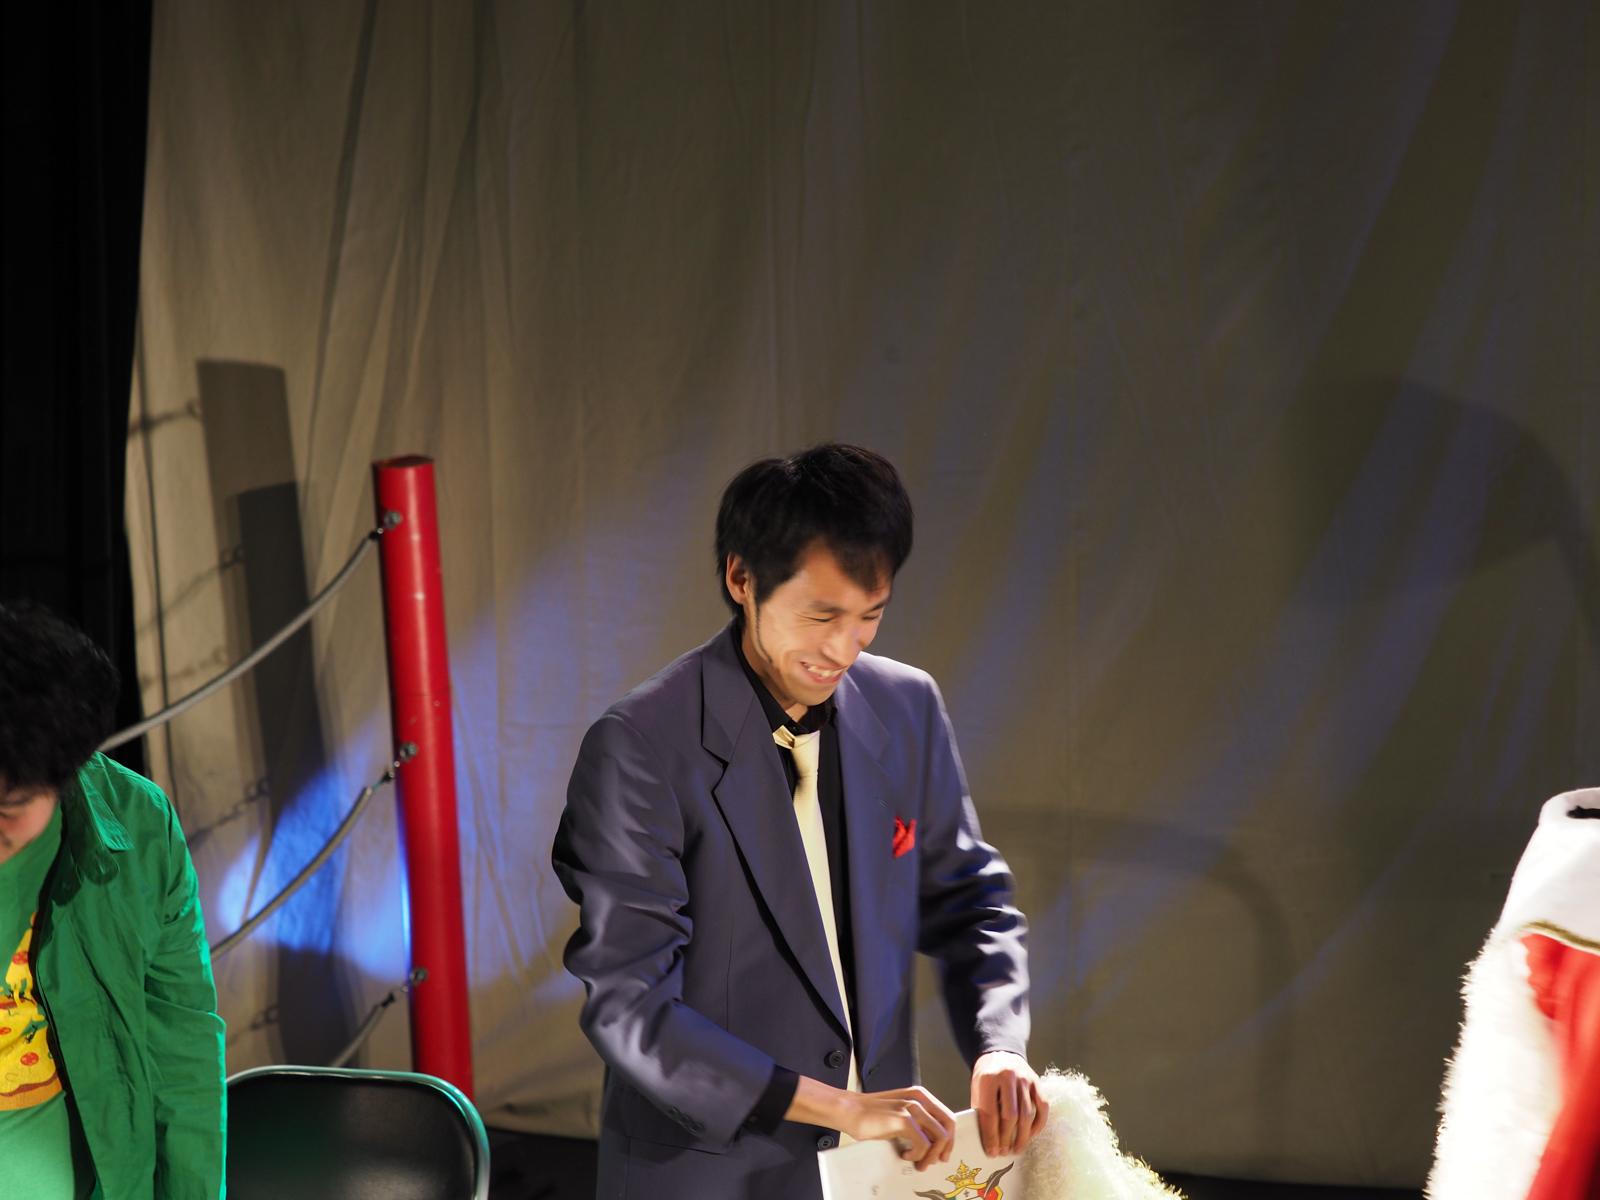 f:id:motomachi24:20161108201503j:plain